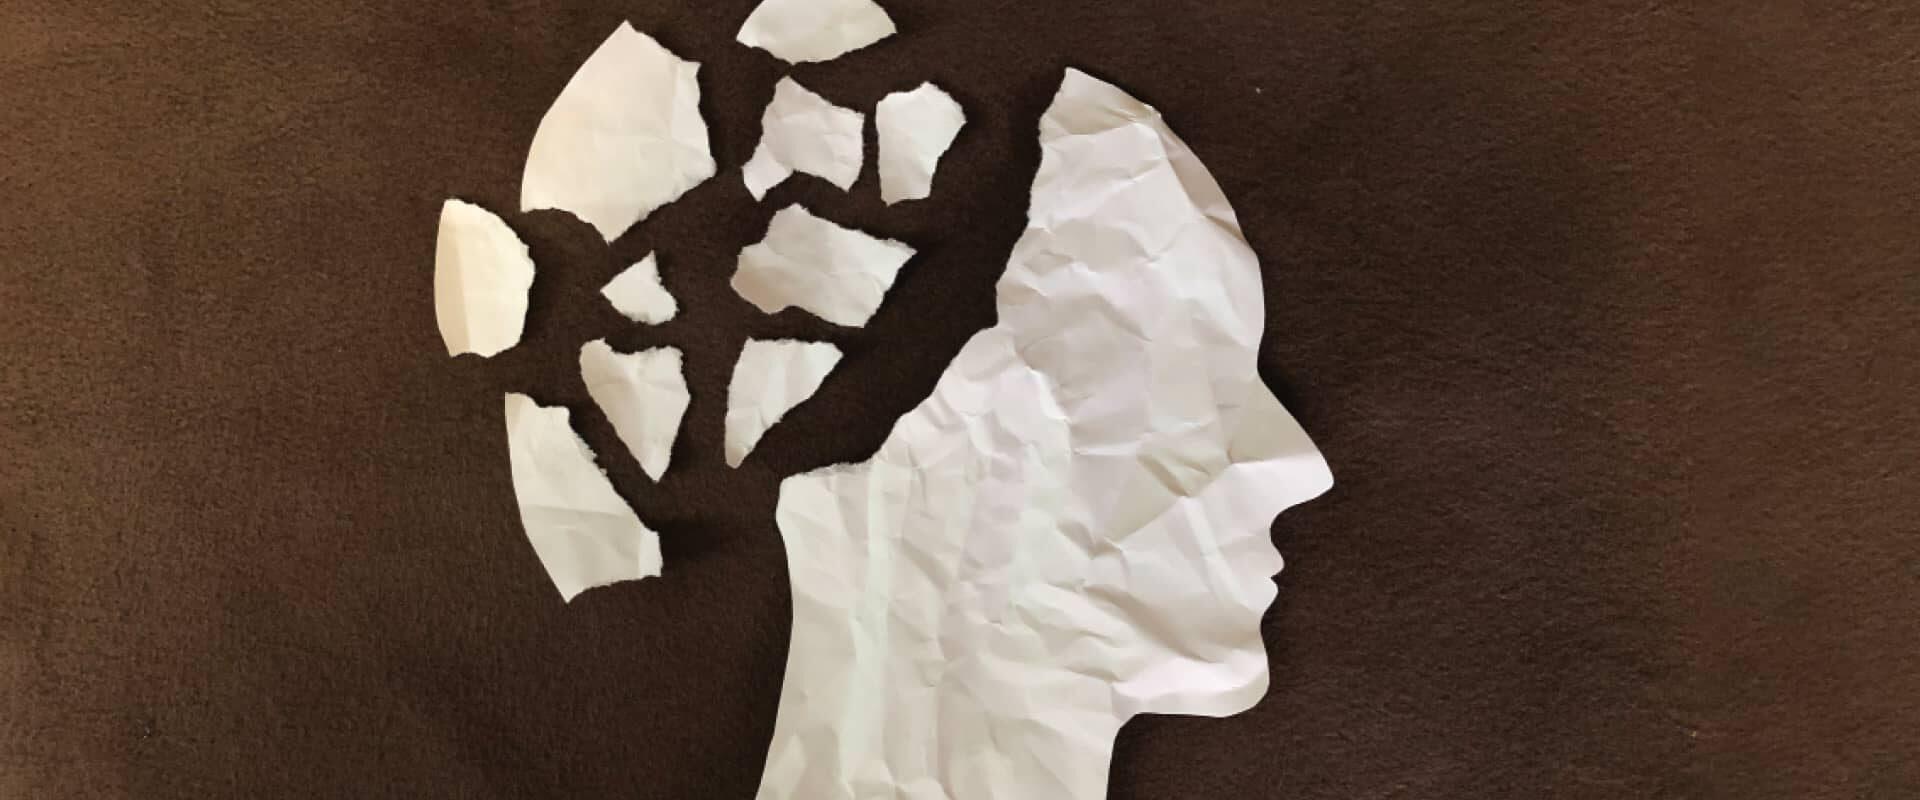 Hearing Loss and Dementia AT336-Main_Images-F1-min(Suzanne_Chanesman)